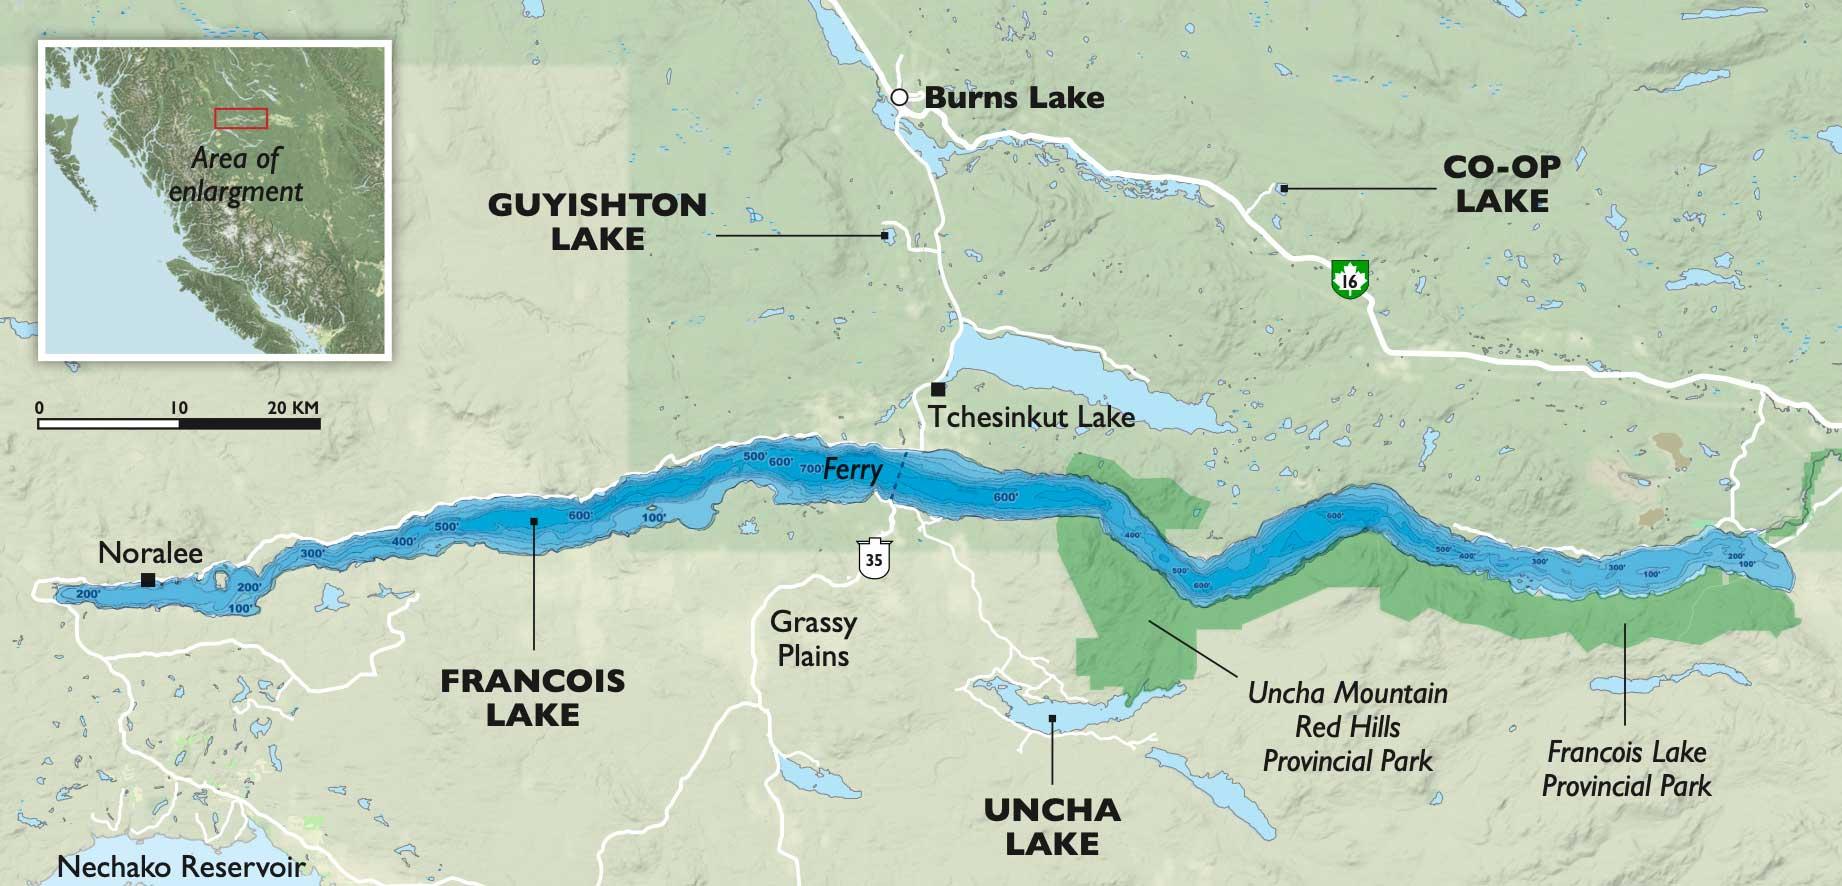 Francois Lake map